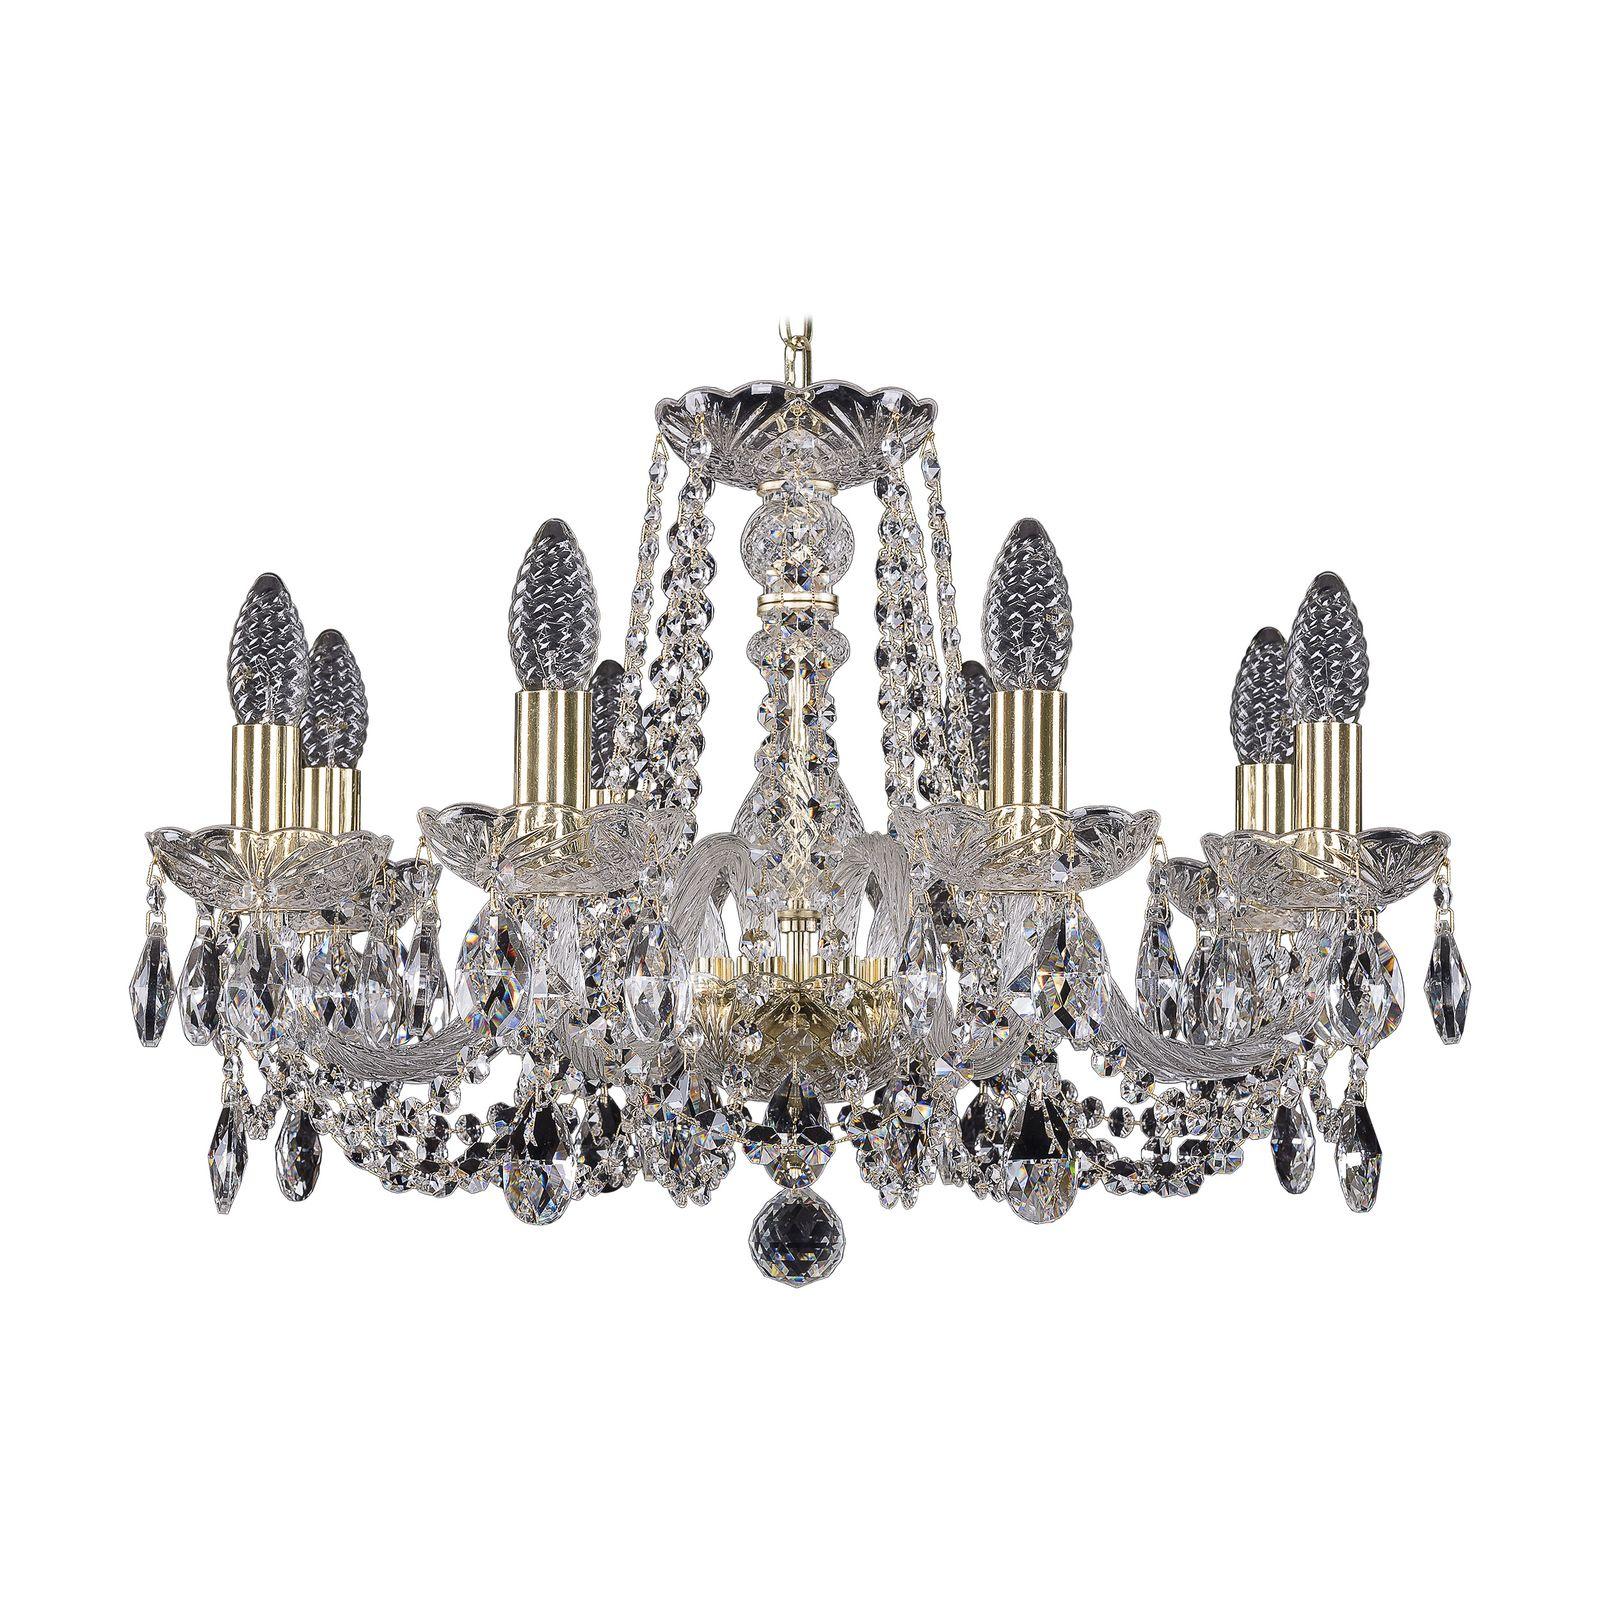 Потолочный светильник Bohemia Ivele Crystal 1402/8/195 G, E14, 40 Вт bohemia ivele crystal 1932 75z g